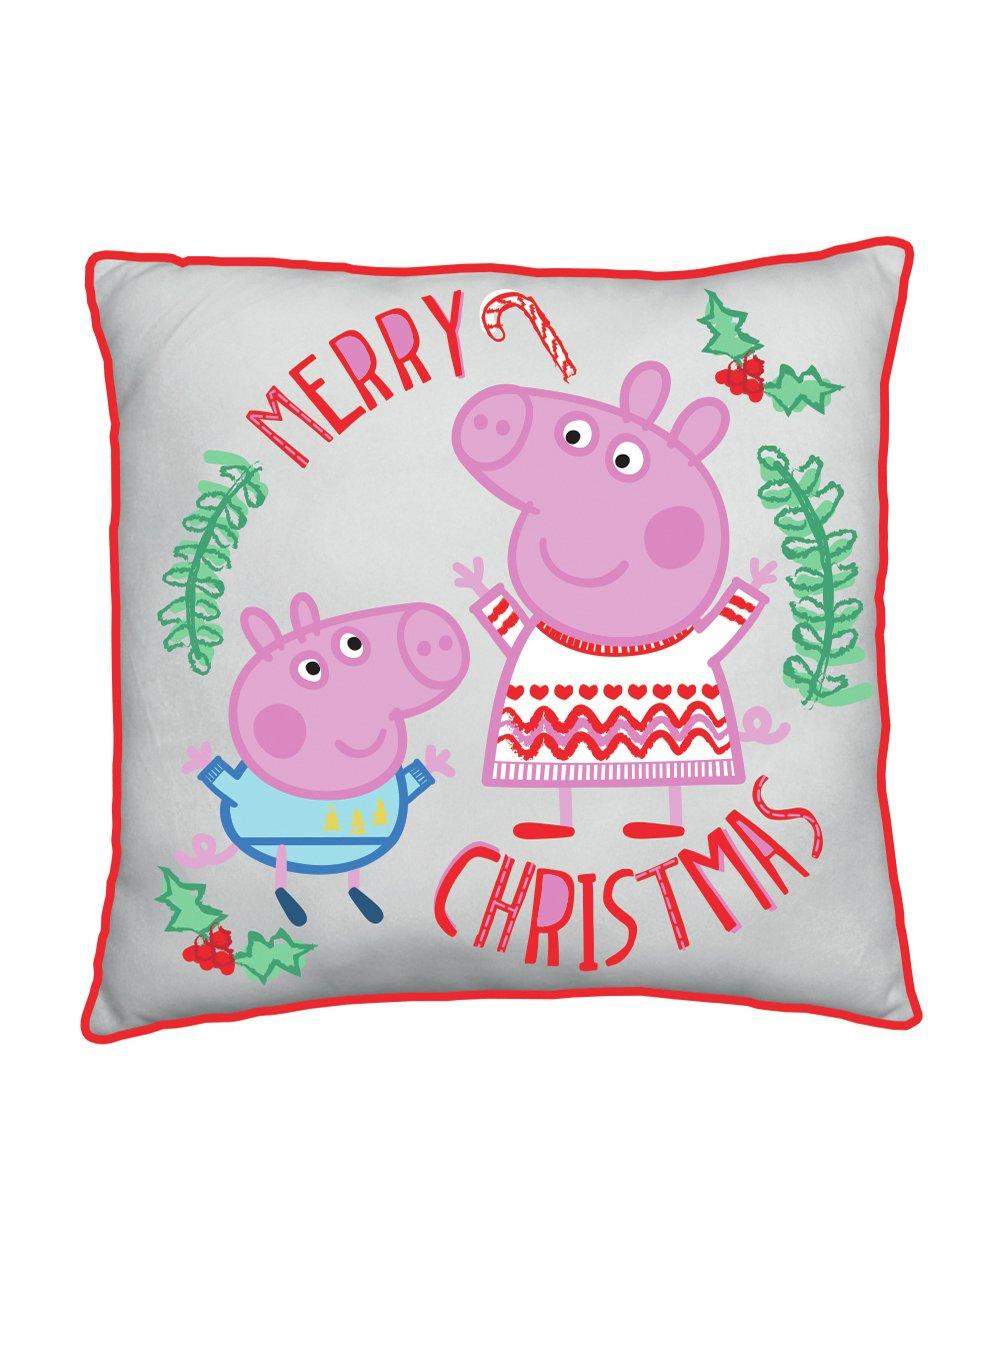 Peppa Pig How Many Sleeps Cushion